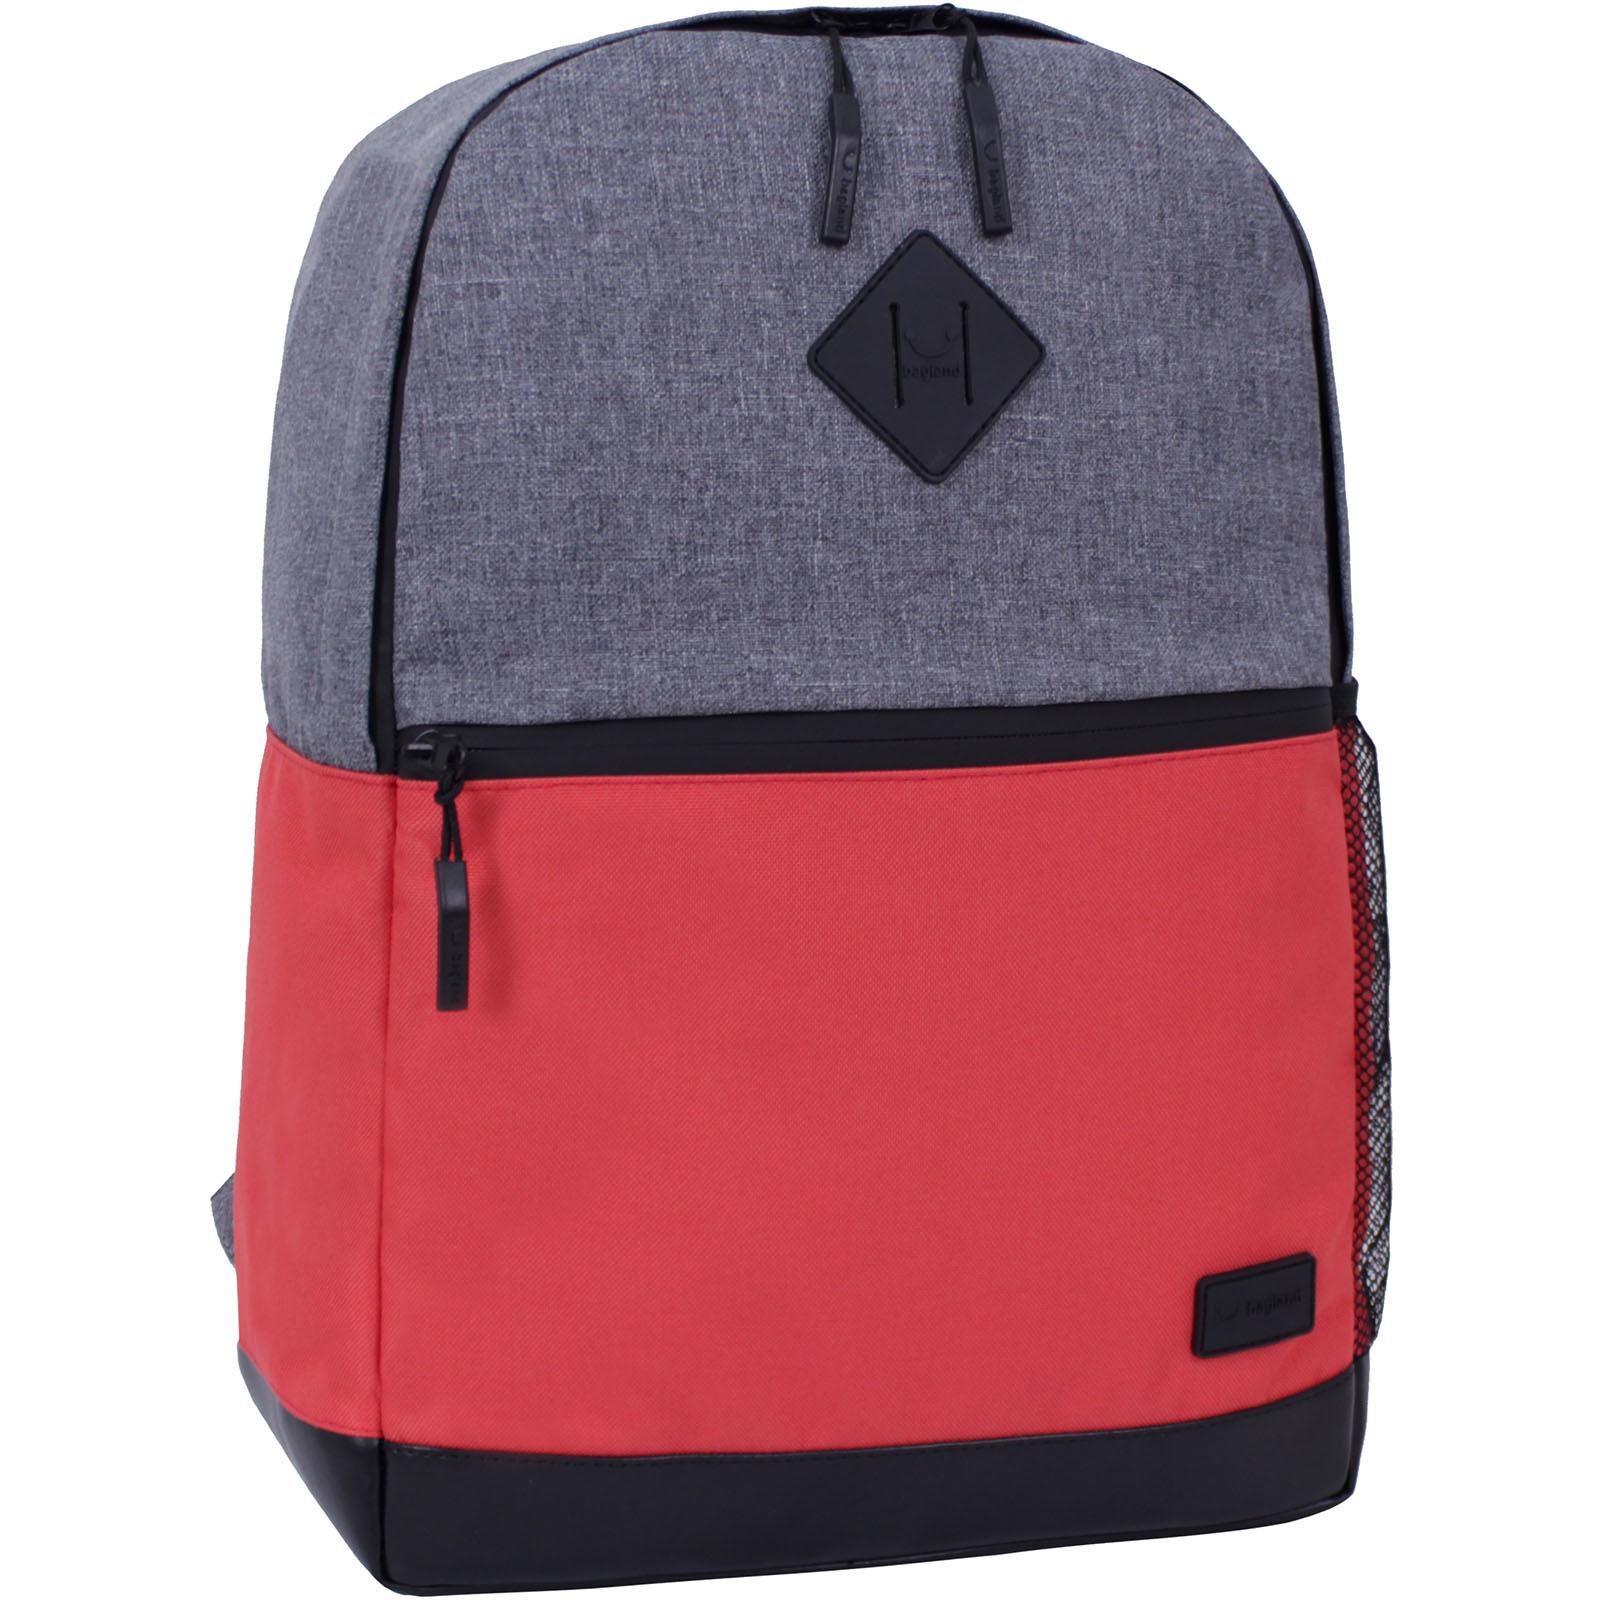 Мужские рюкзаки Рюкзак Bagland Tanos 19л. 321 серый (0014869) IMG_2290.JPG